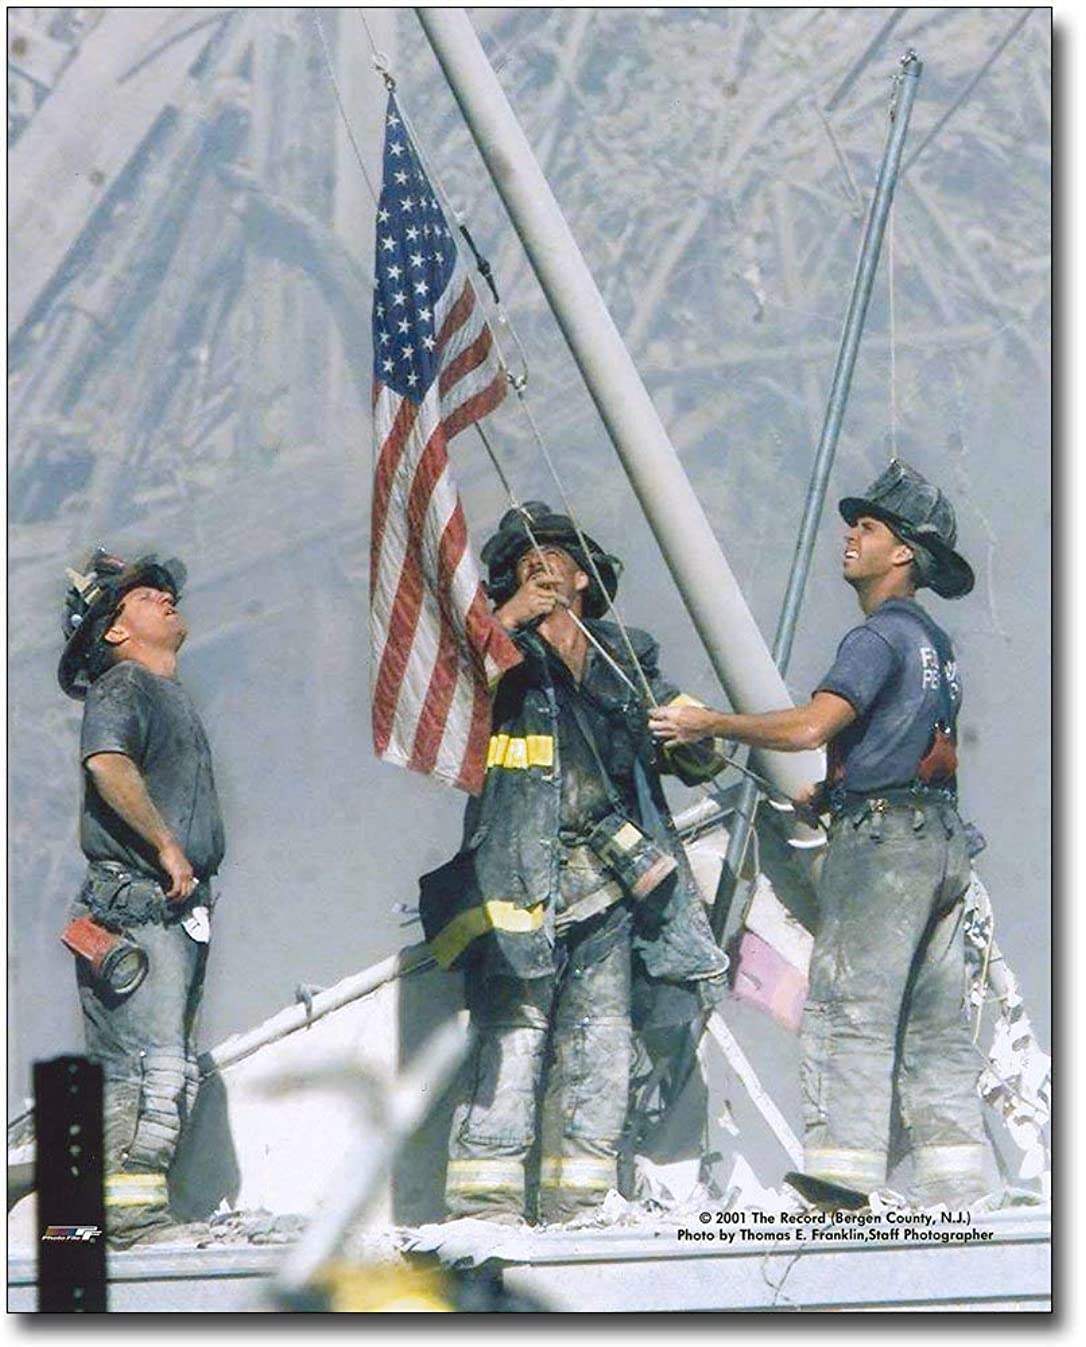 New York Firefighters Raising Flag 9/11 NYC 8x10 Silver Halide Photo Print